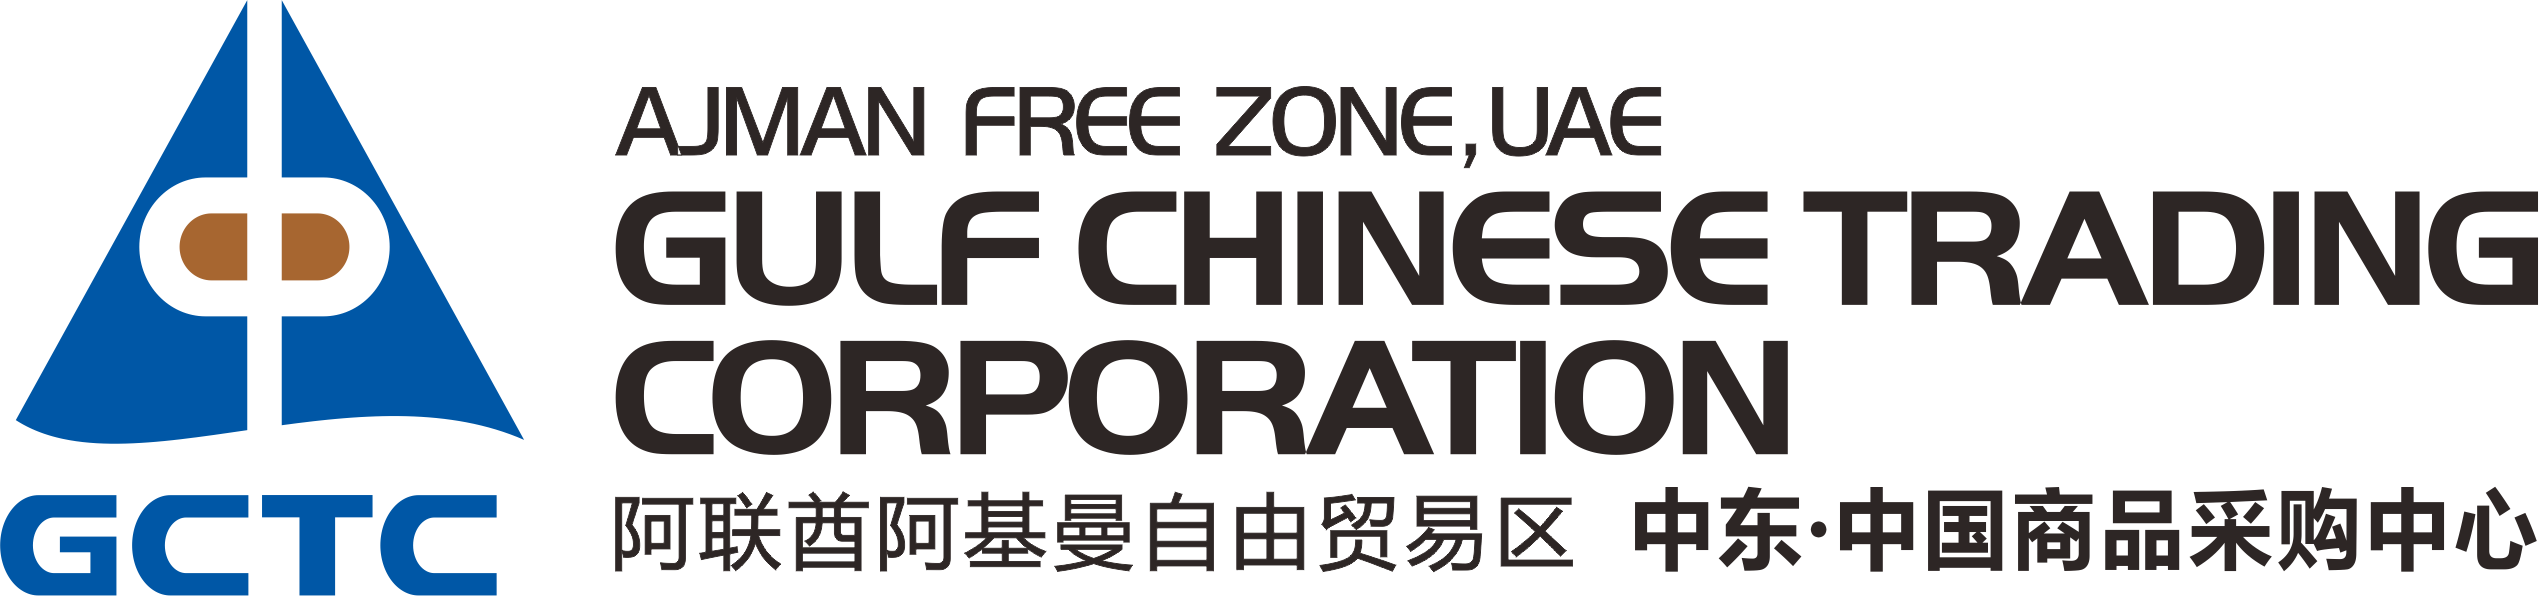 Gulf Chinese Trading Corporation FZC